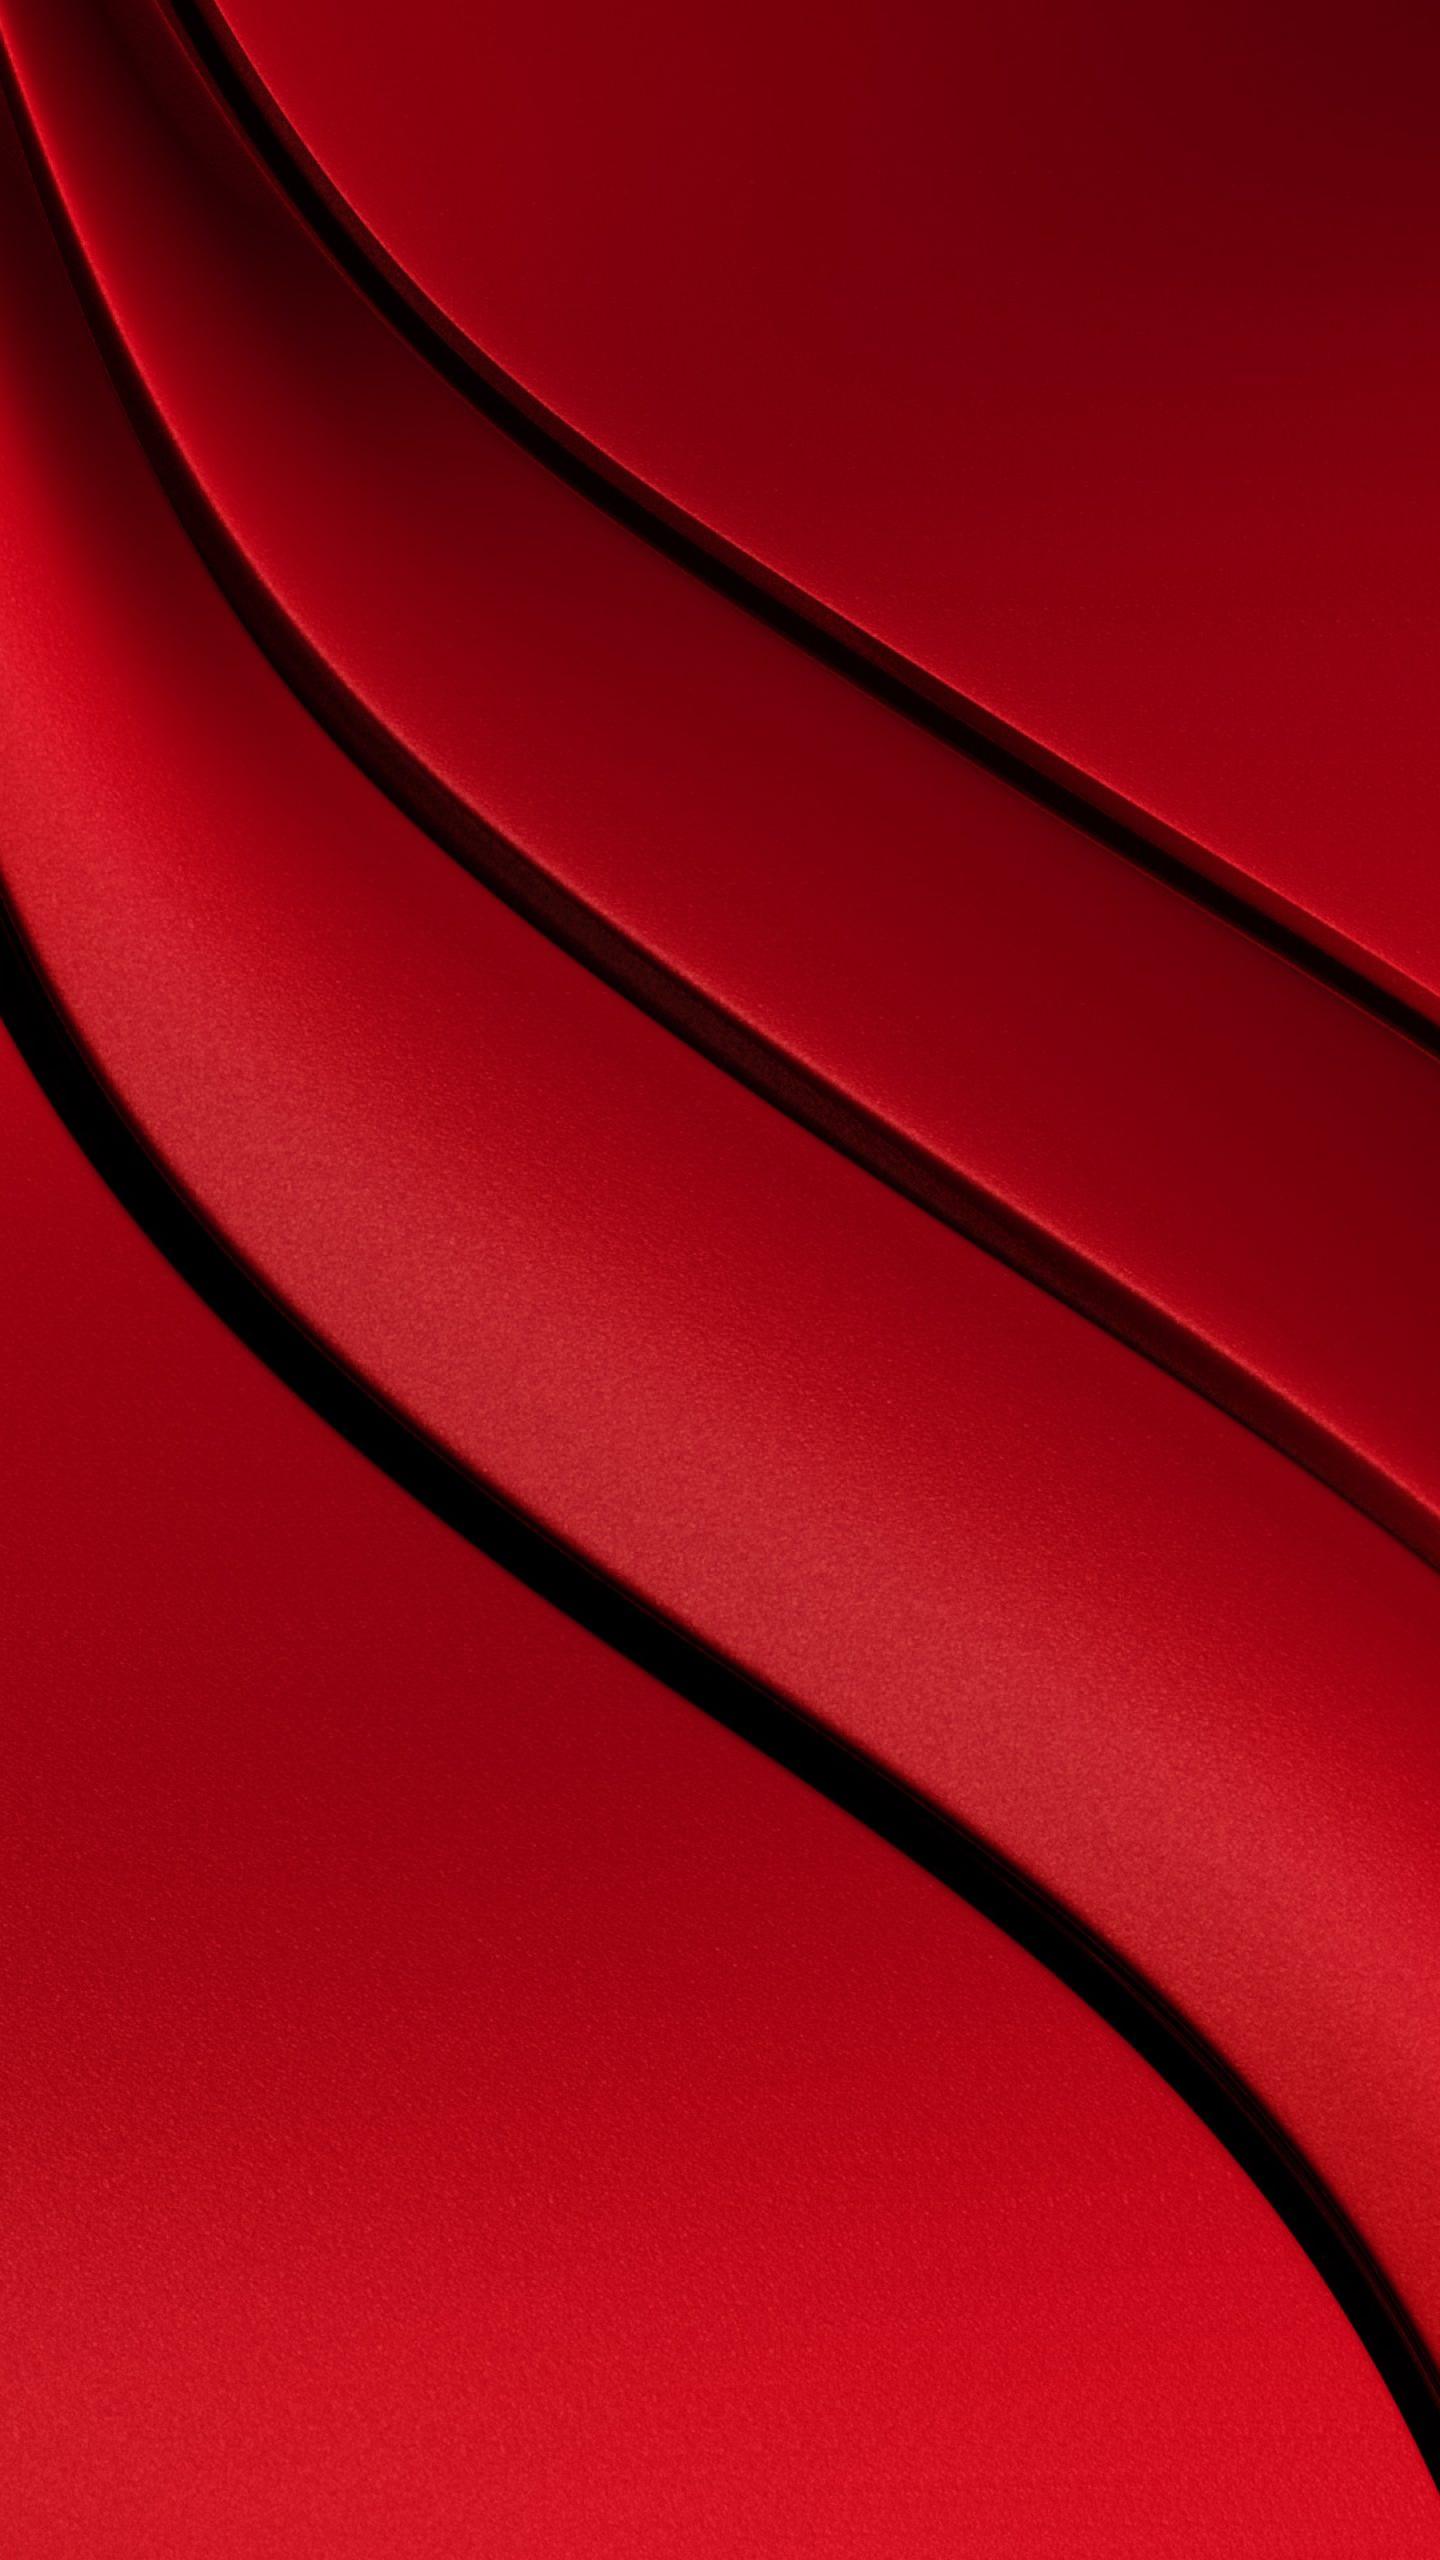 Red Cool | wallpaper.sc SmartPhone